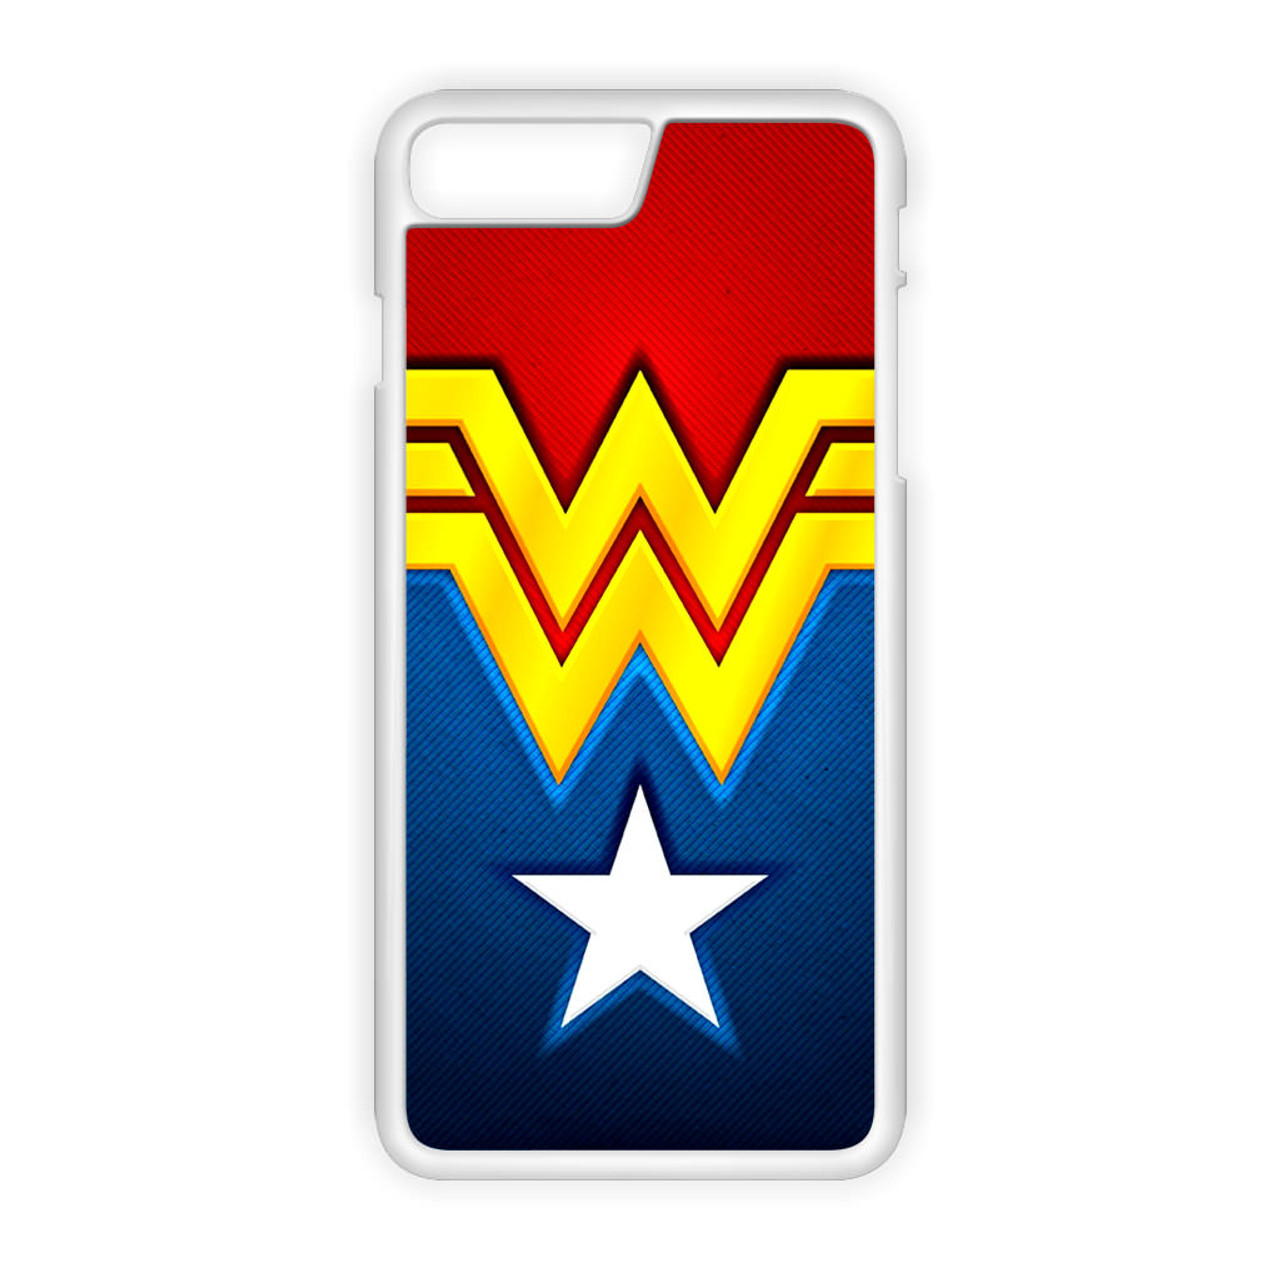 WONDER WOMAN LOGO 2 iphone case